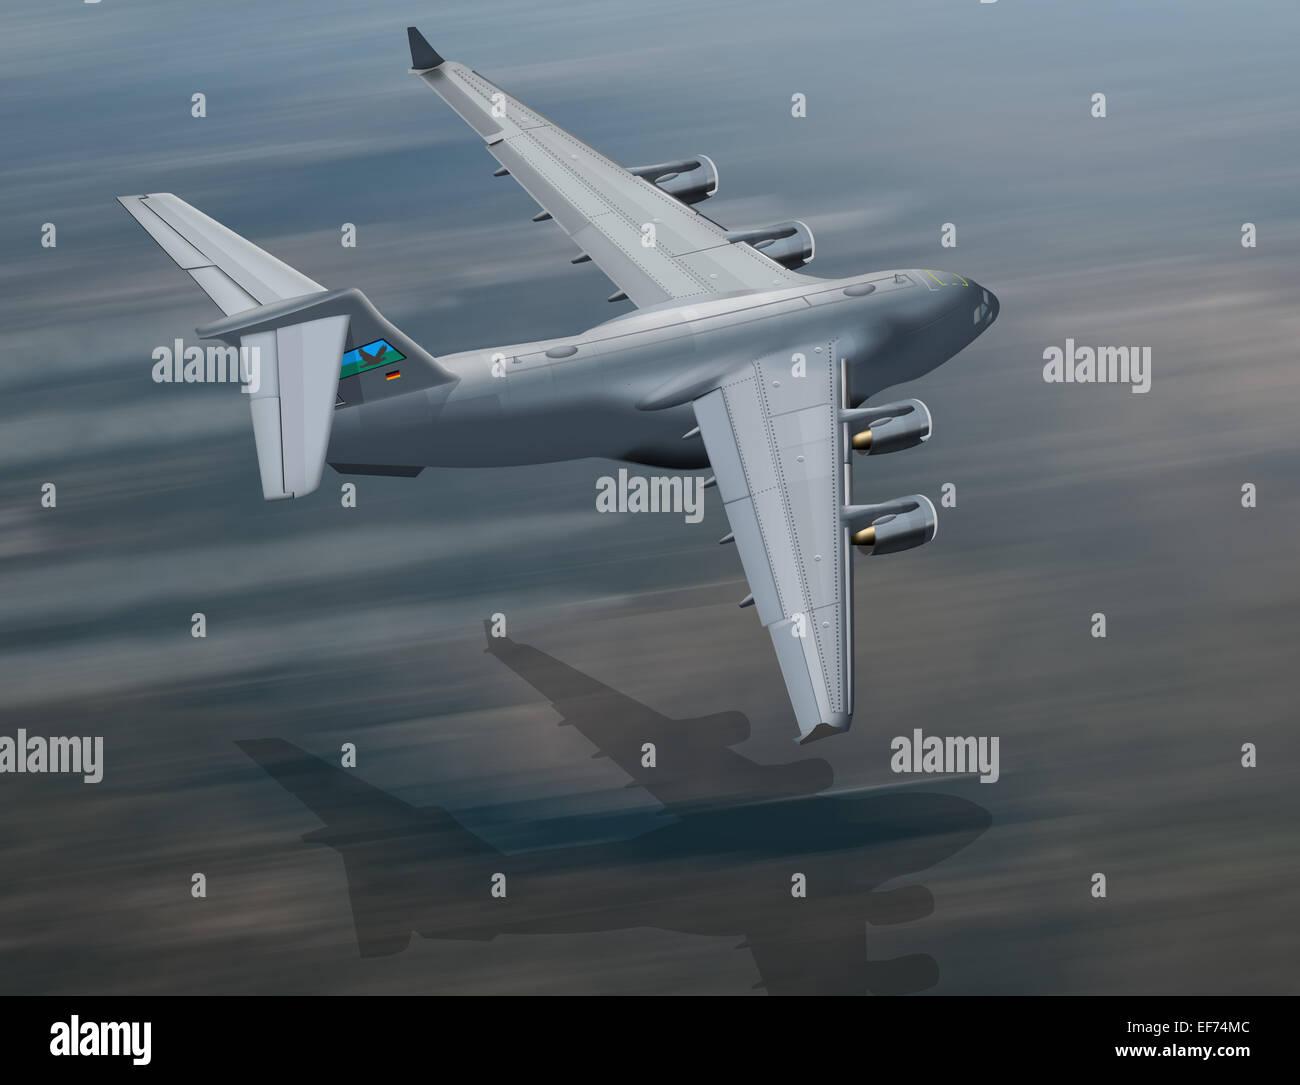 C17 military transport plane at low altitude, illustration - Stock Image